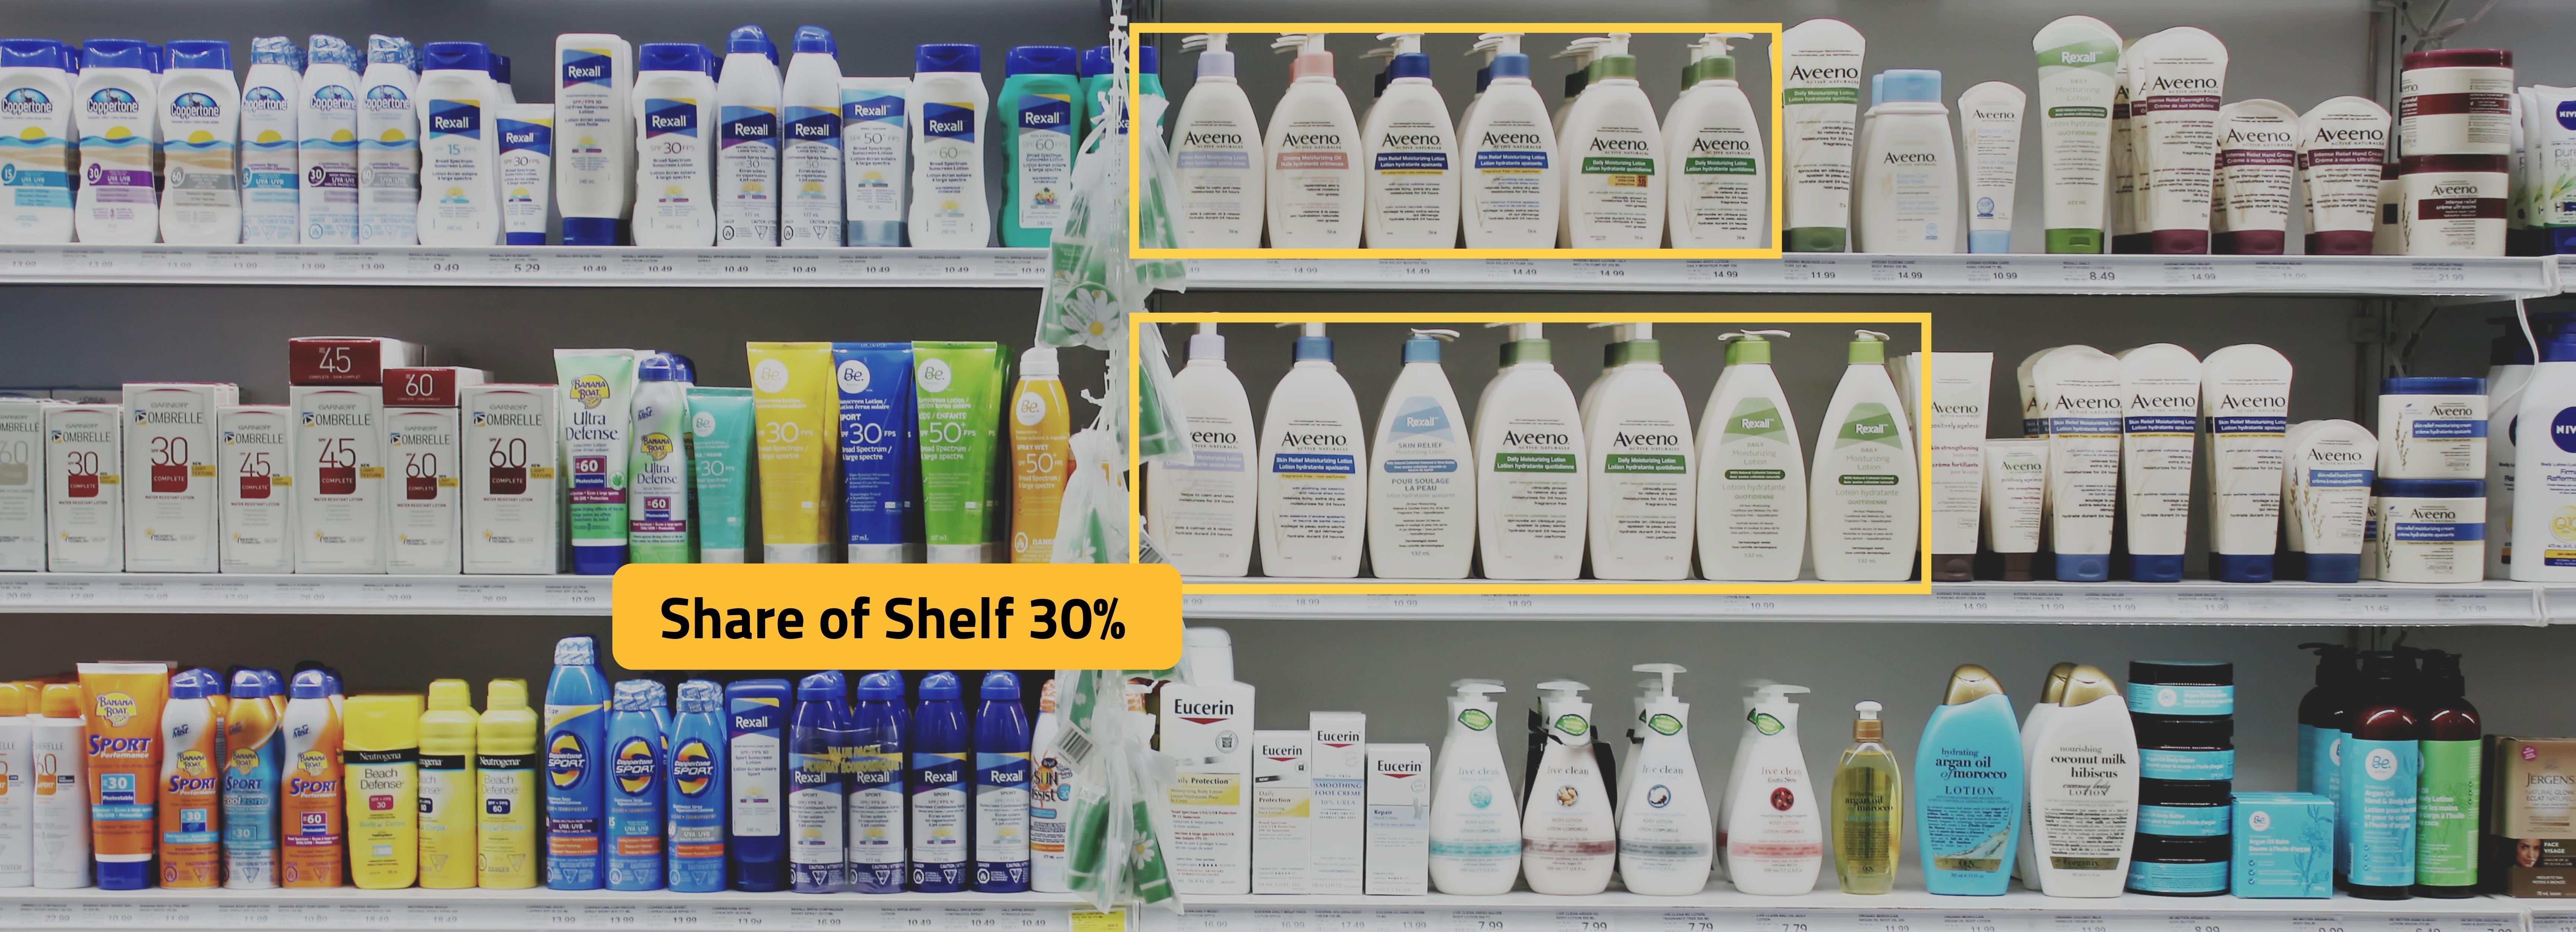 Improving Share of Shelf